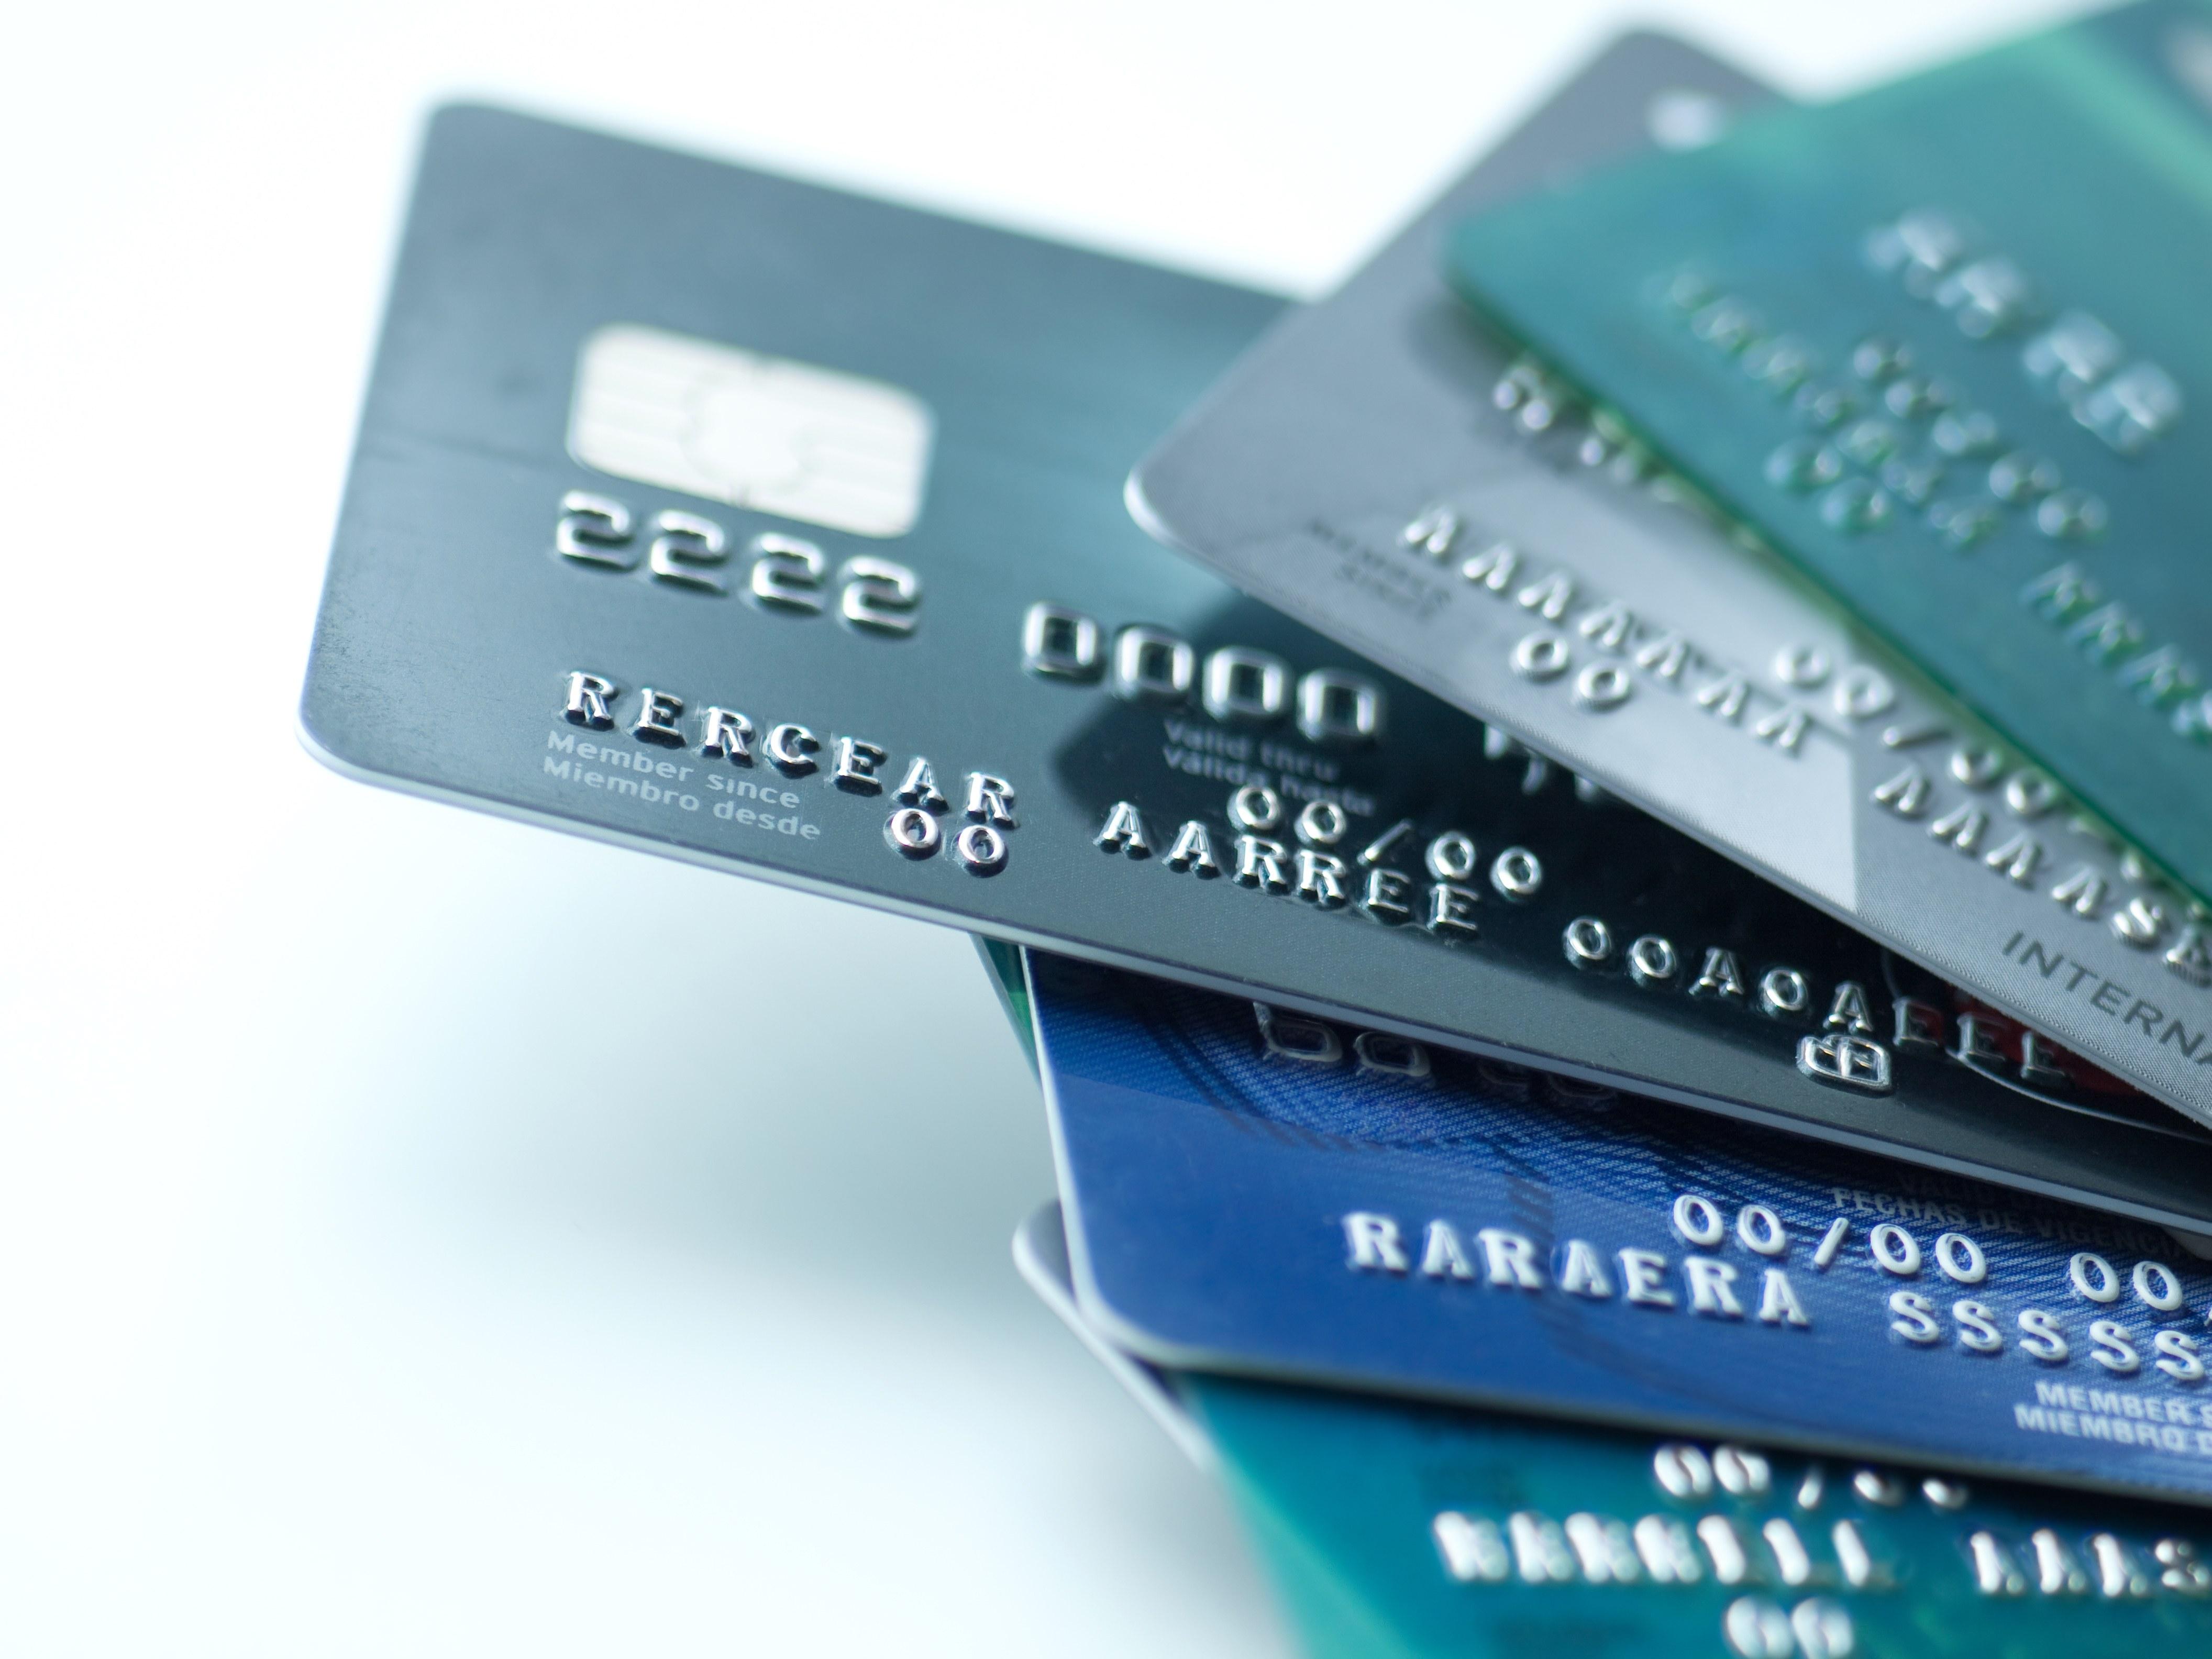 The Best Travel Credit Card - Condé Nast Traveler